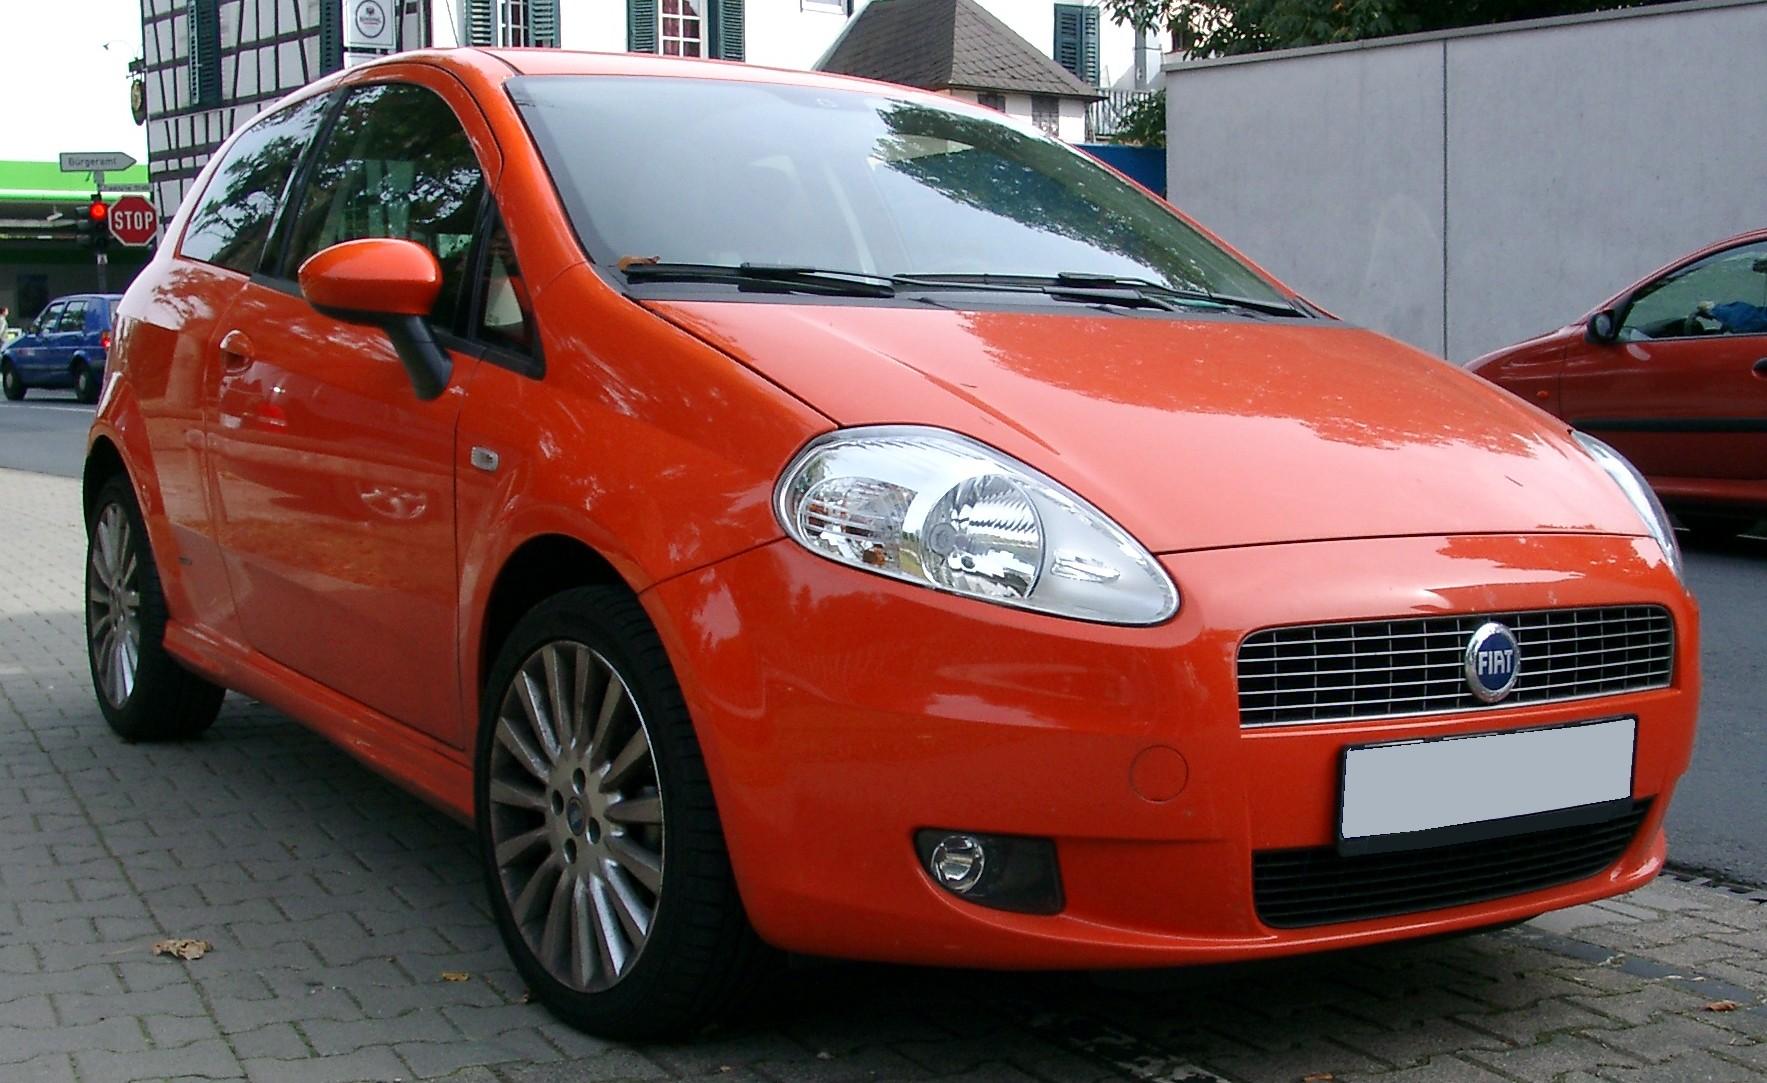 Fiat Punto 1.4 T-Jet